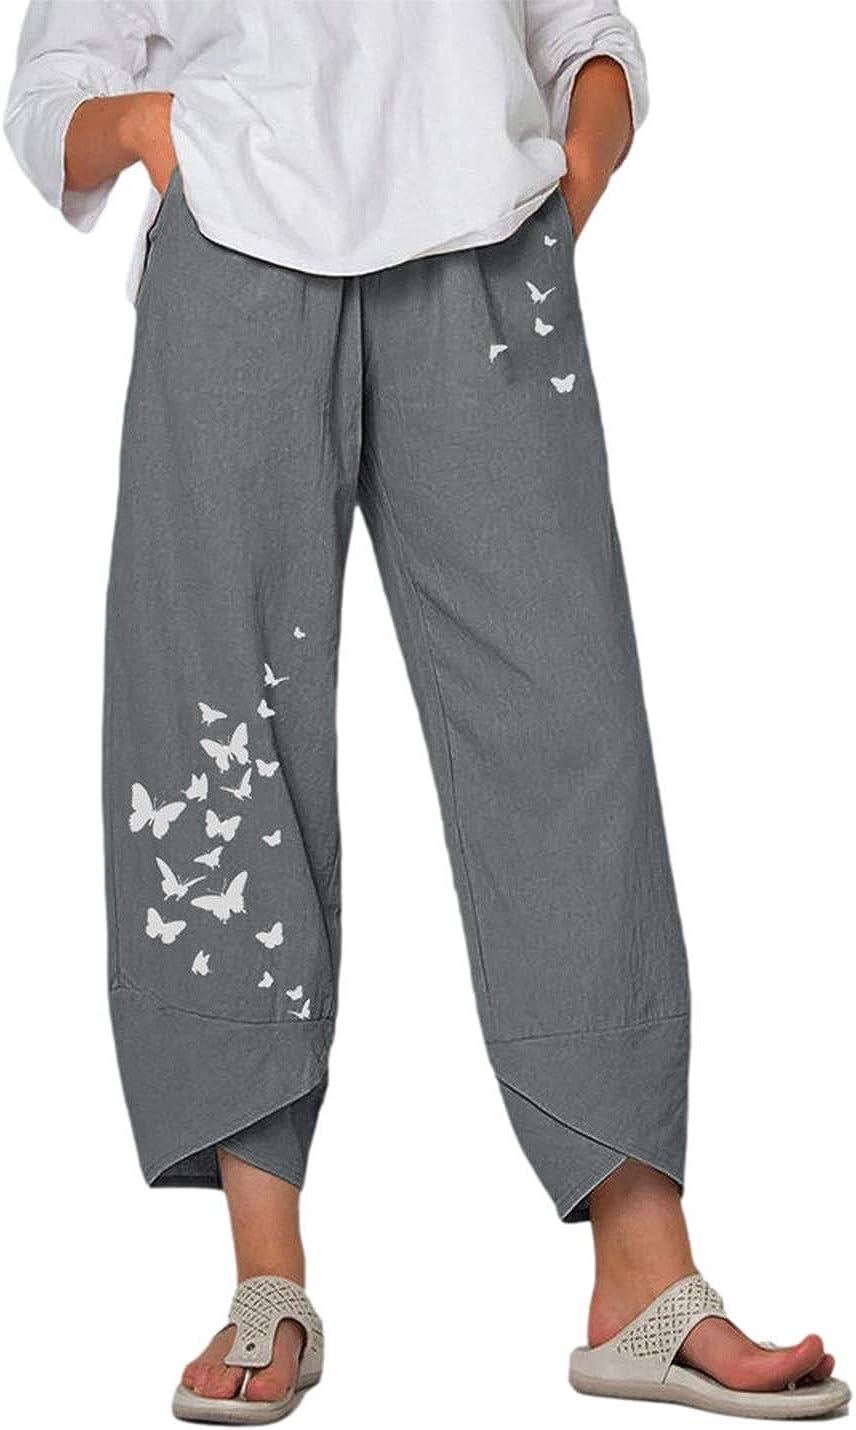 Lentta Women's Casual Summer Lightweight Wide Leg Loose Cotton Cropped Tulip Pants